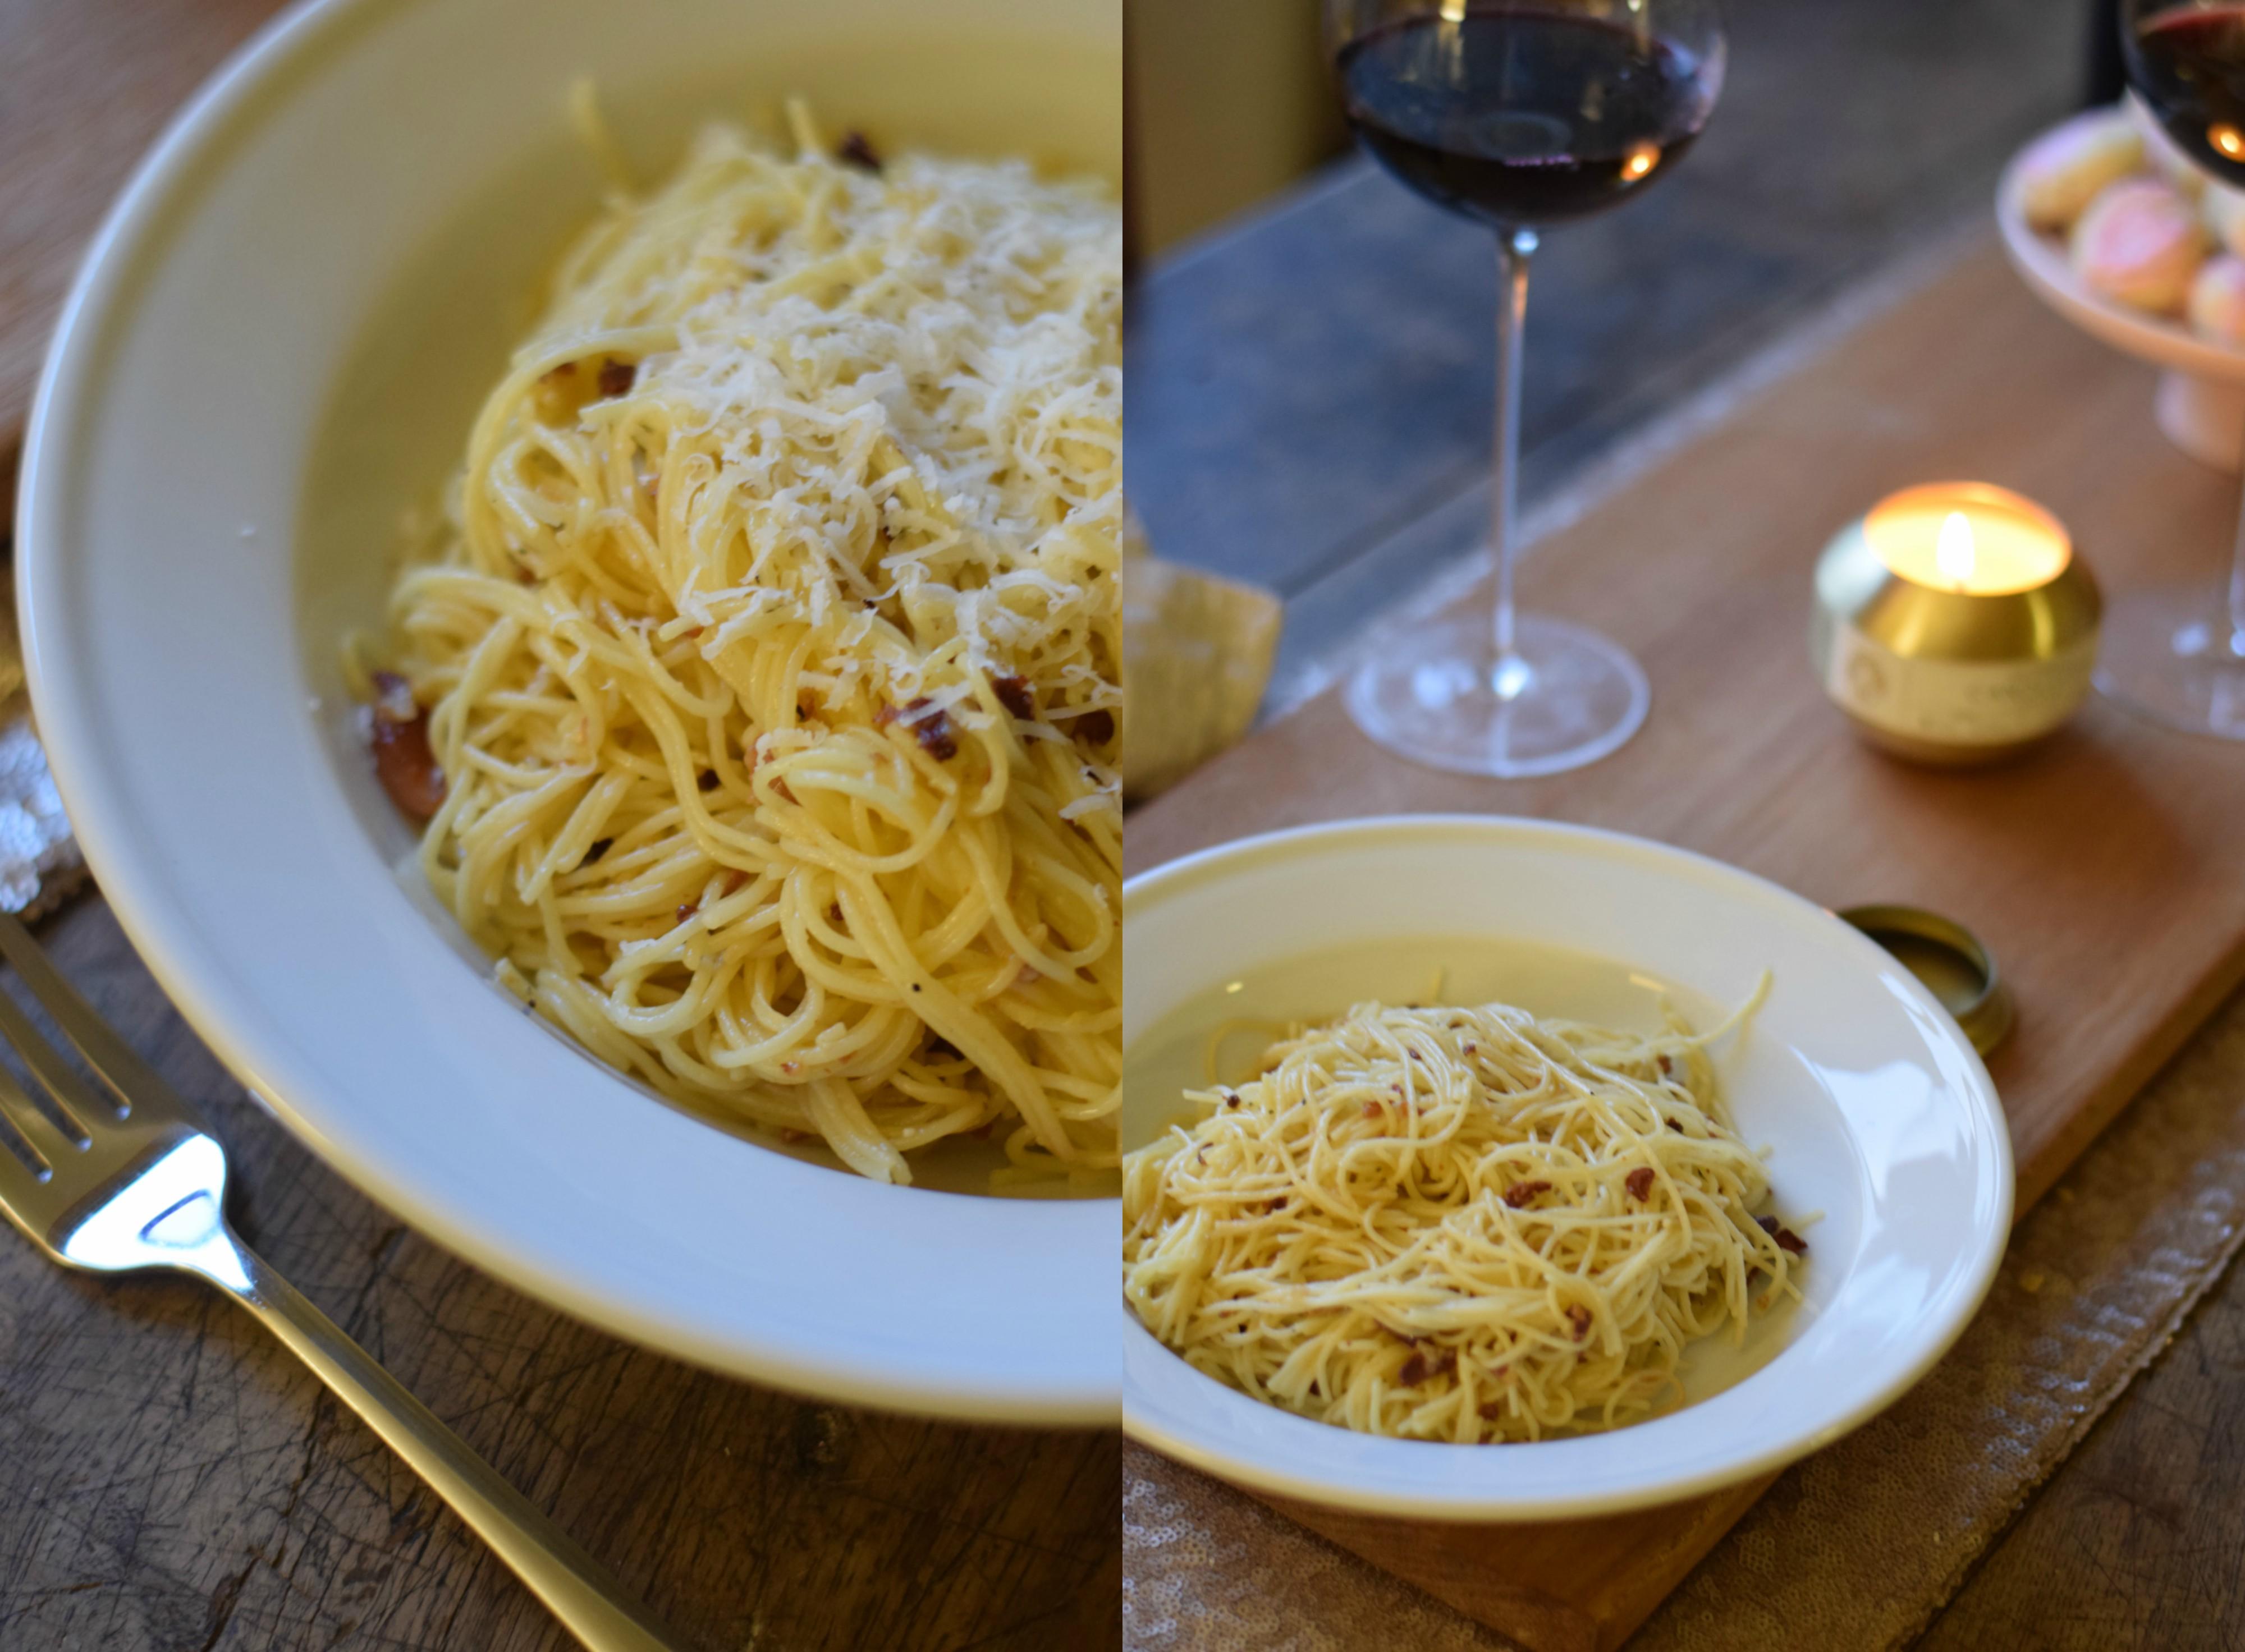 Homemade Spaghetti Carbonara - Date Night In Meal Ideas - Authentic Pasta Carbonara Recipe - Easy Spaghetti Carbonara - Easy Dinner Recipe - Communikait by Kait Hanson